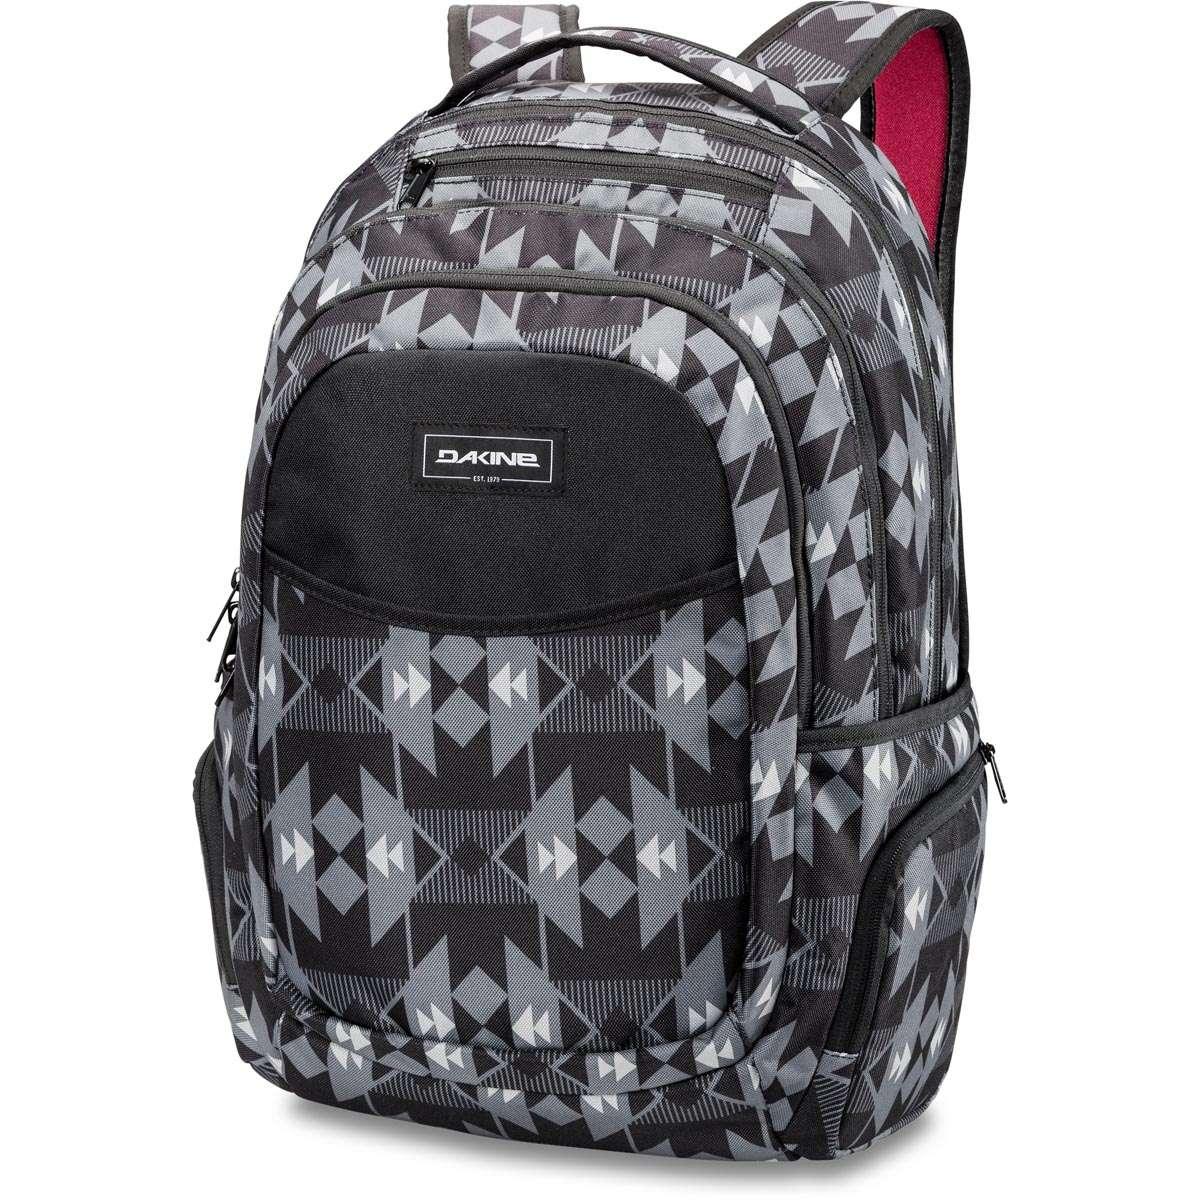 af806720b6f36 Dakine Prom SR 27L Backpack Fireside II